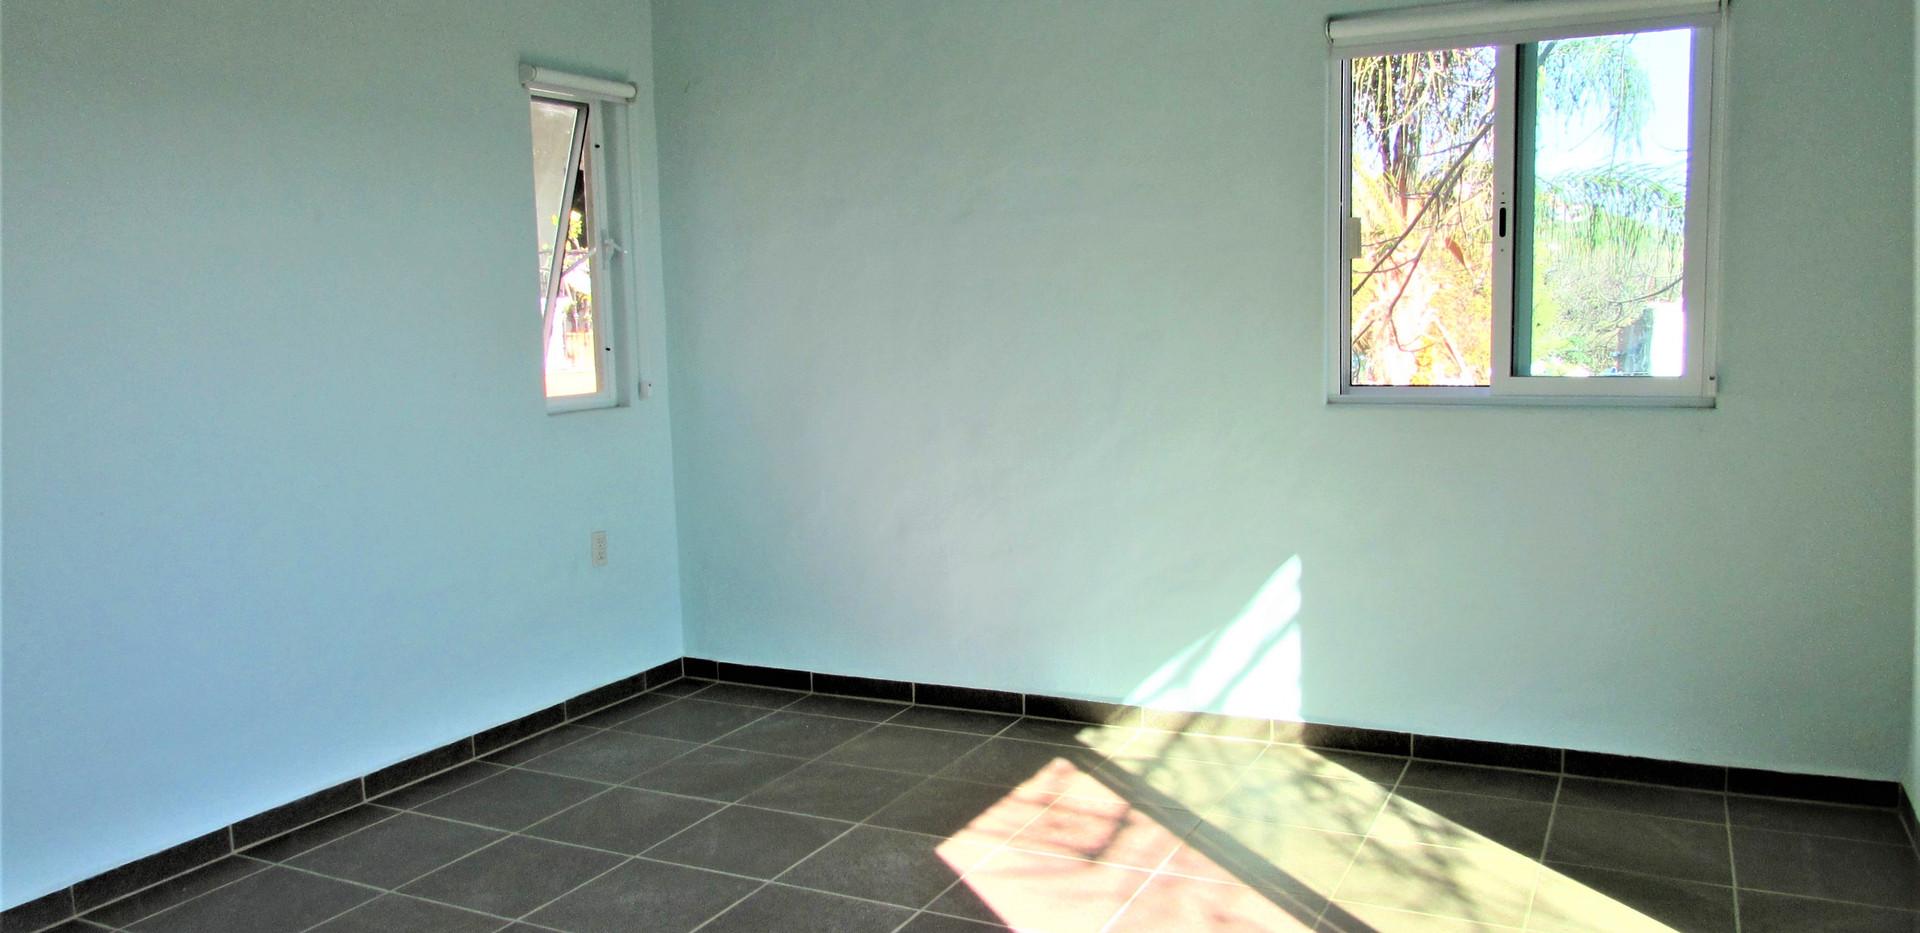 Cornejos- Second bedroom